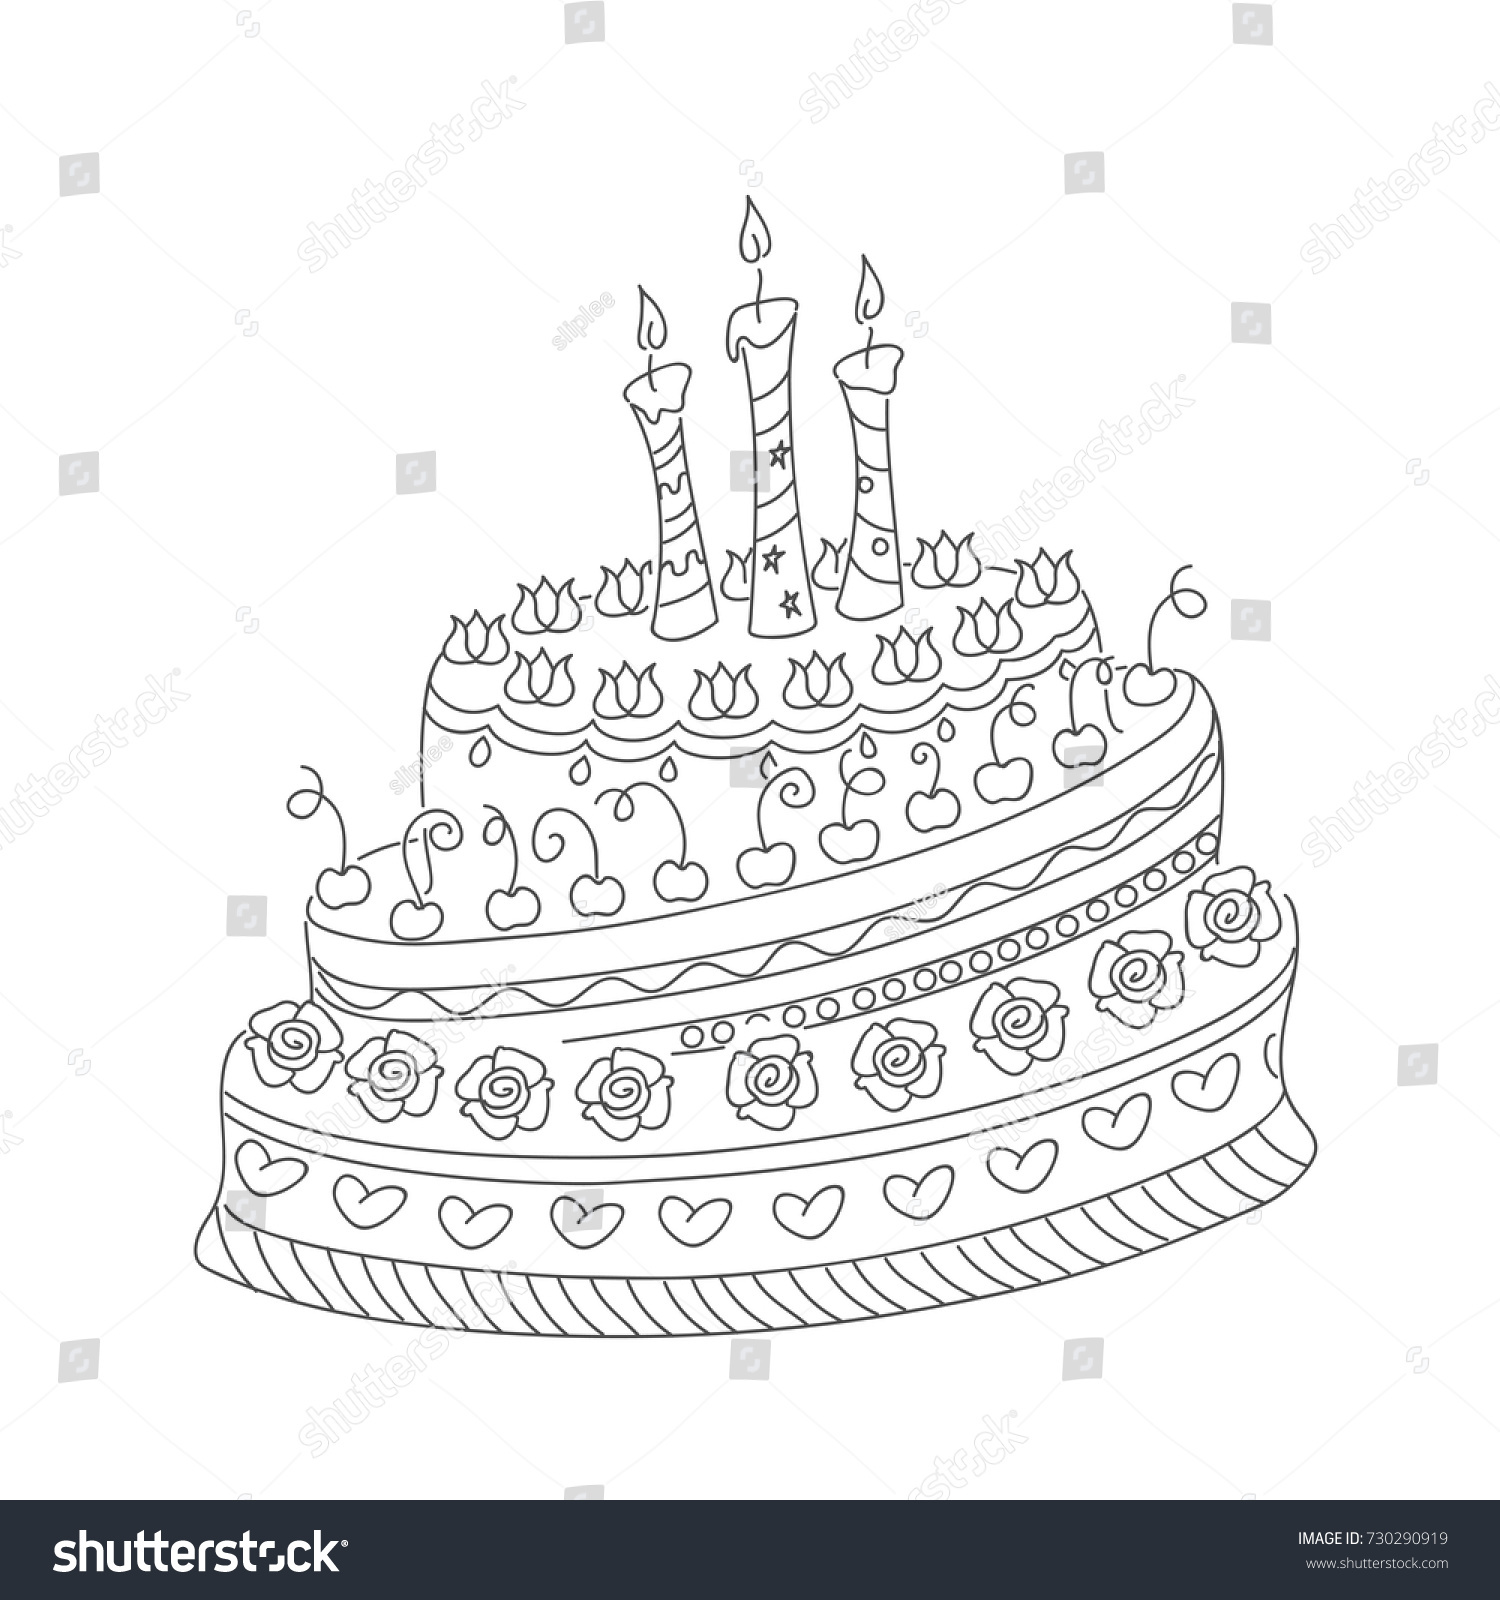 Sketch Monochrome Cake Birthday Card Children Stock Vector 730290919